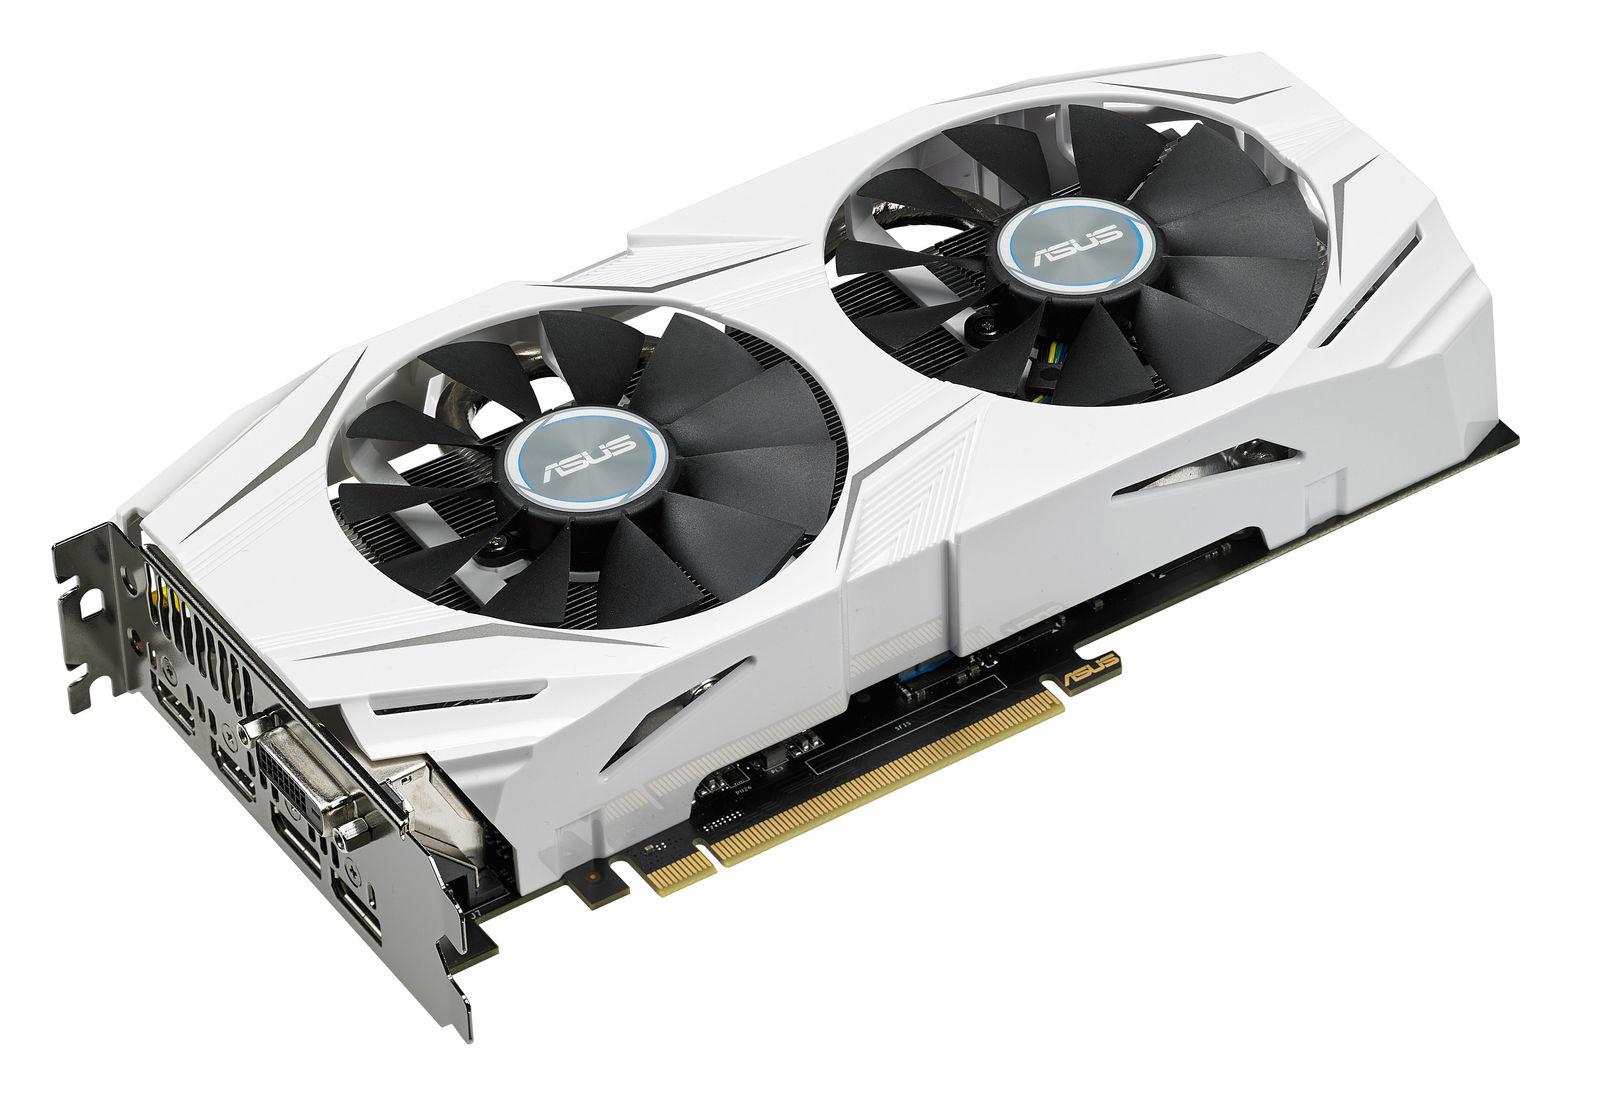 8gb ASUS GeForce GTX 1070 dual OC